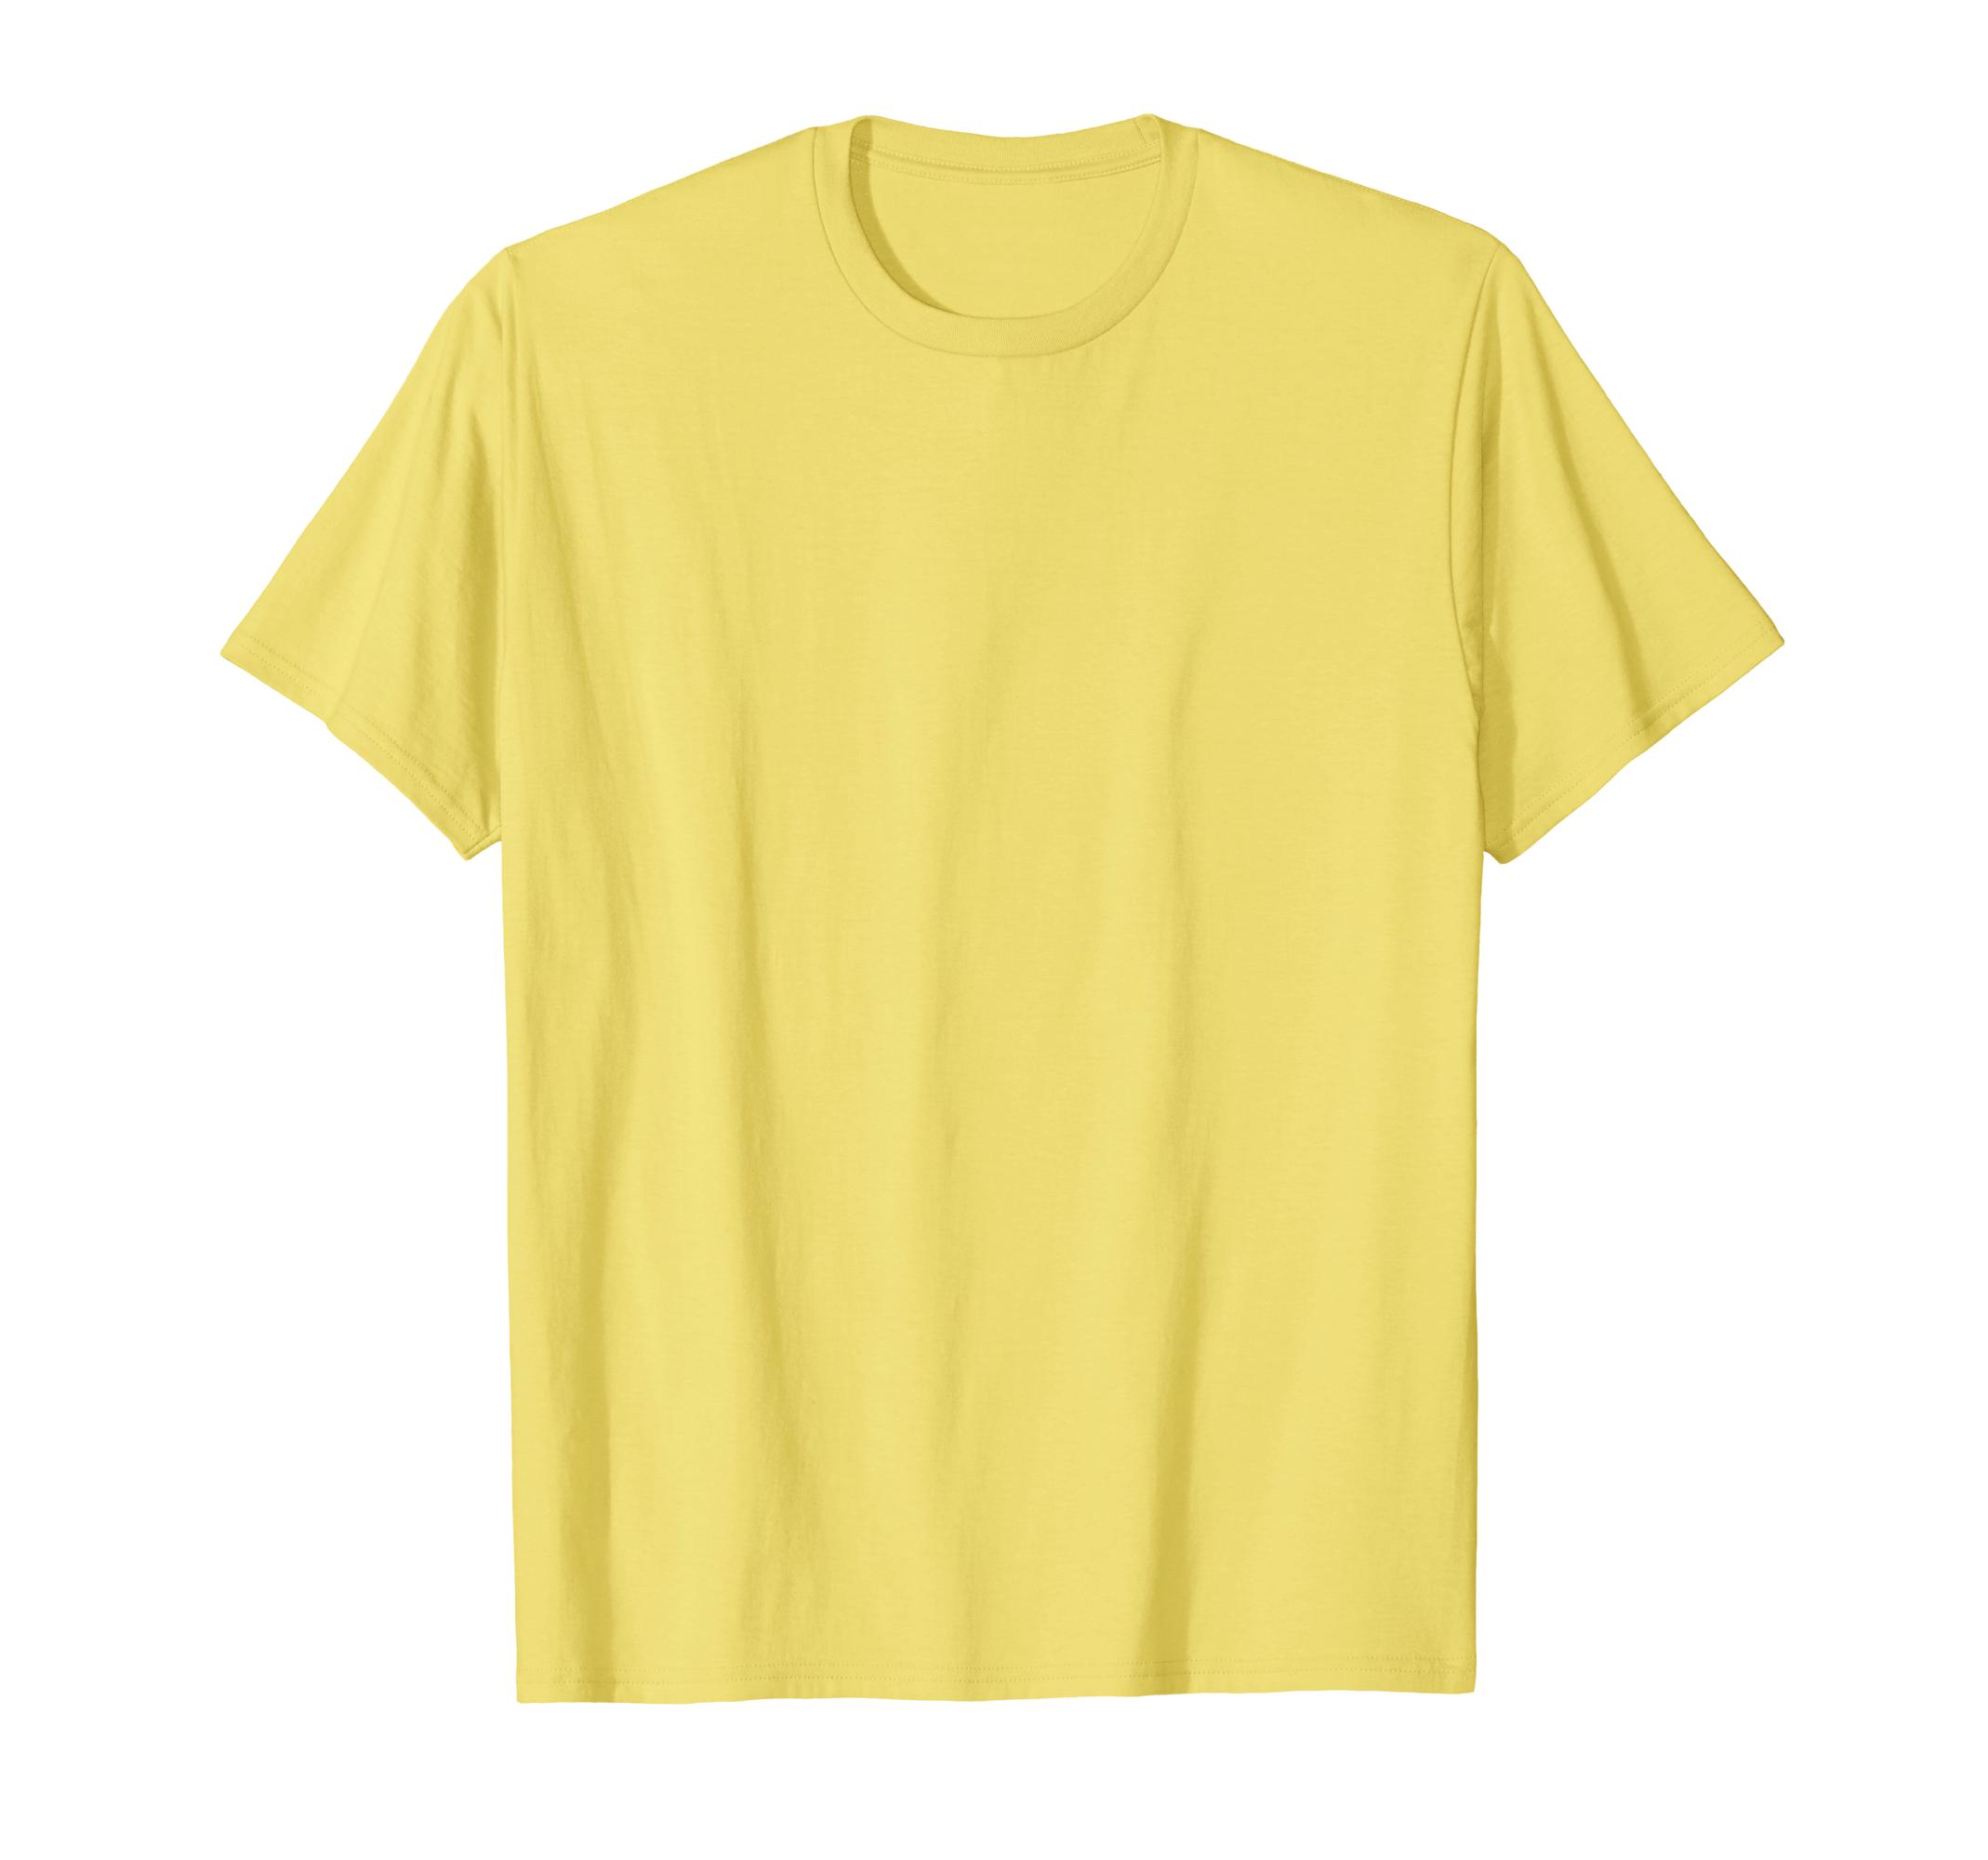 Funny T-shirt For Fast Shipping 2019 Hot Sale Free Shipping Monkey Ninja T-shirts